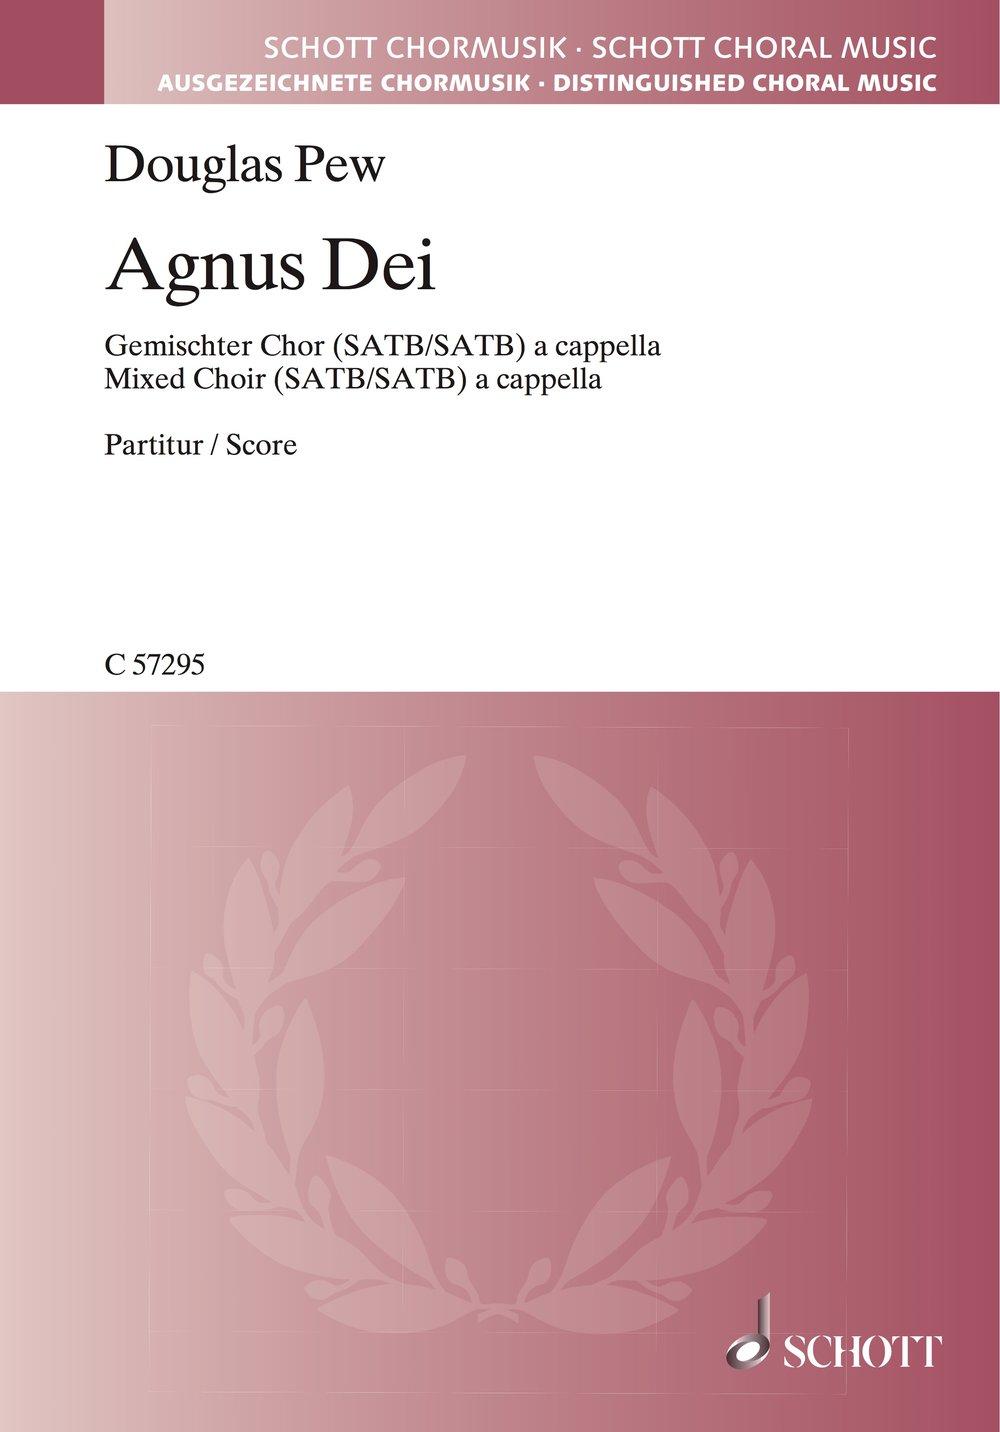 Agnus Dei  - Double Chorus